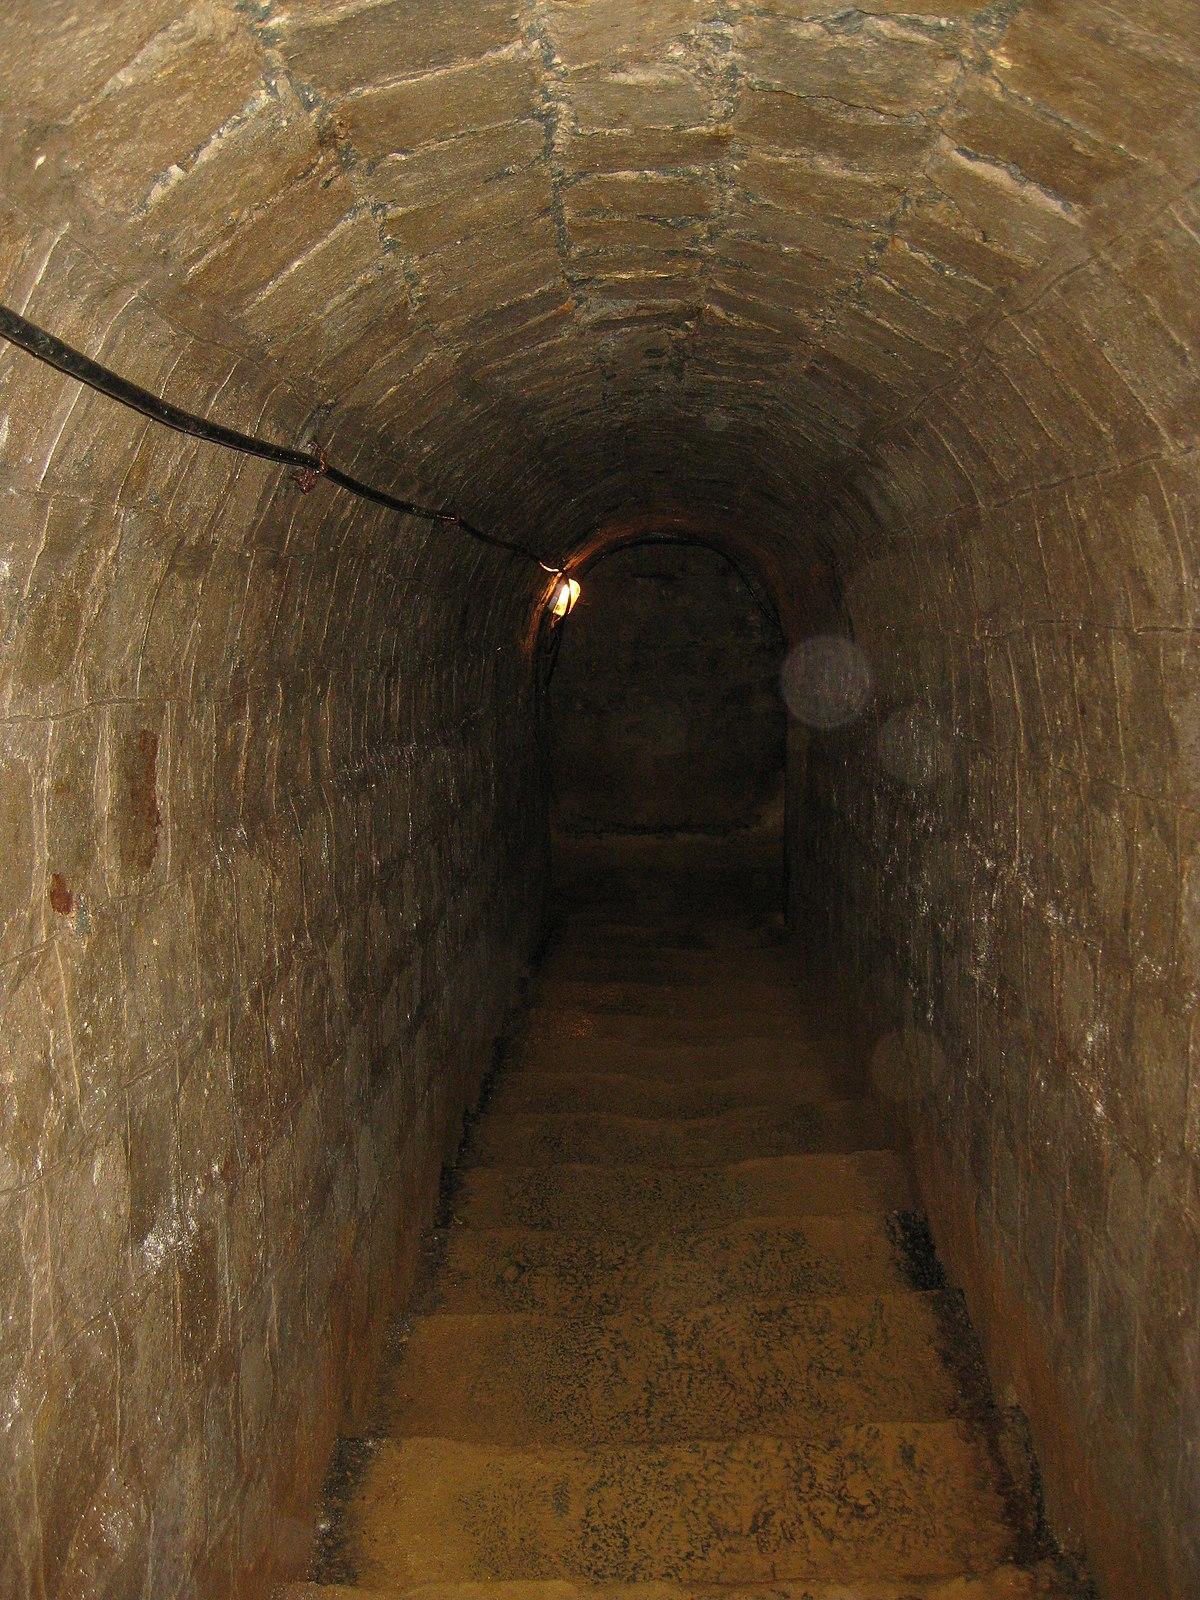 Rosia Montana Roman Gold Mines 2011 - Entrance Stairs-1.jpg